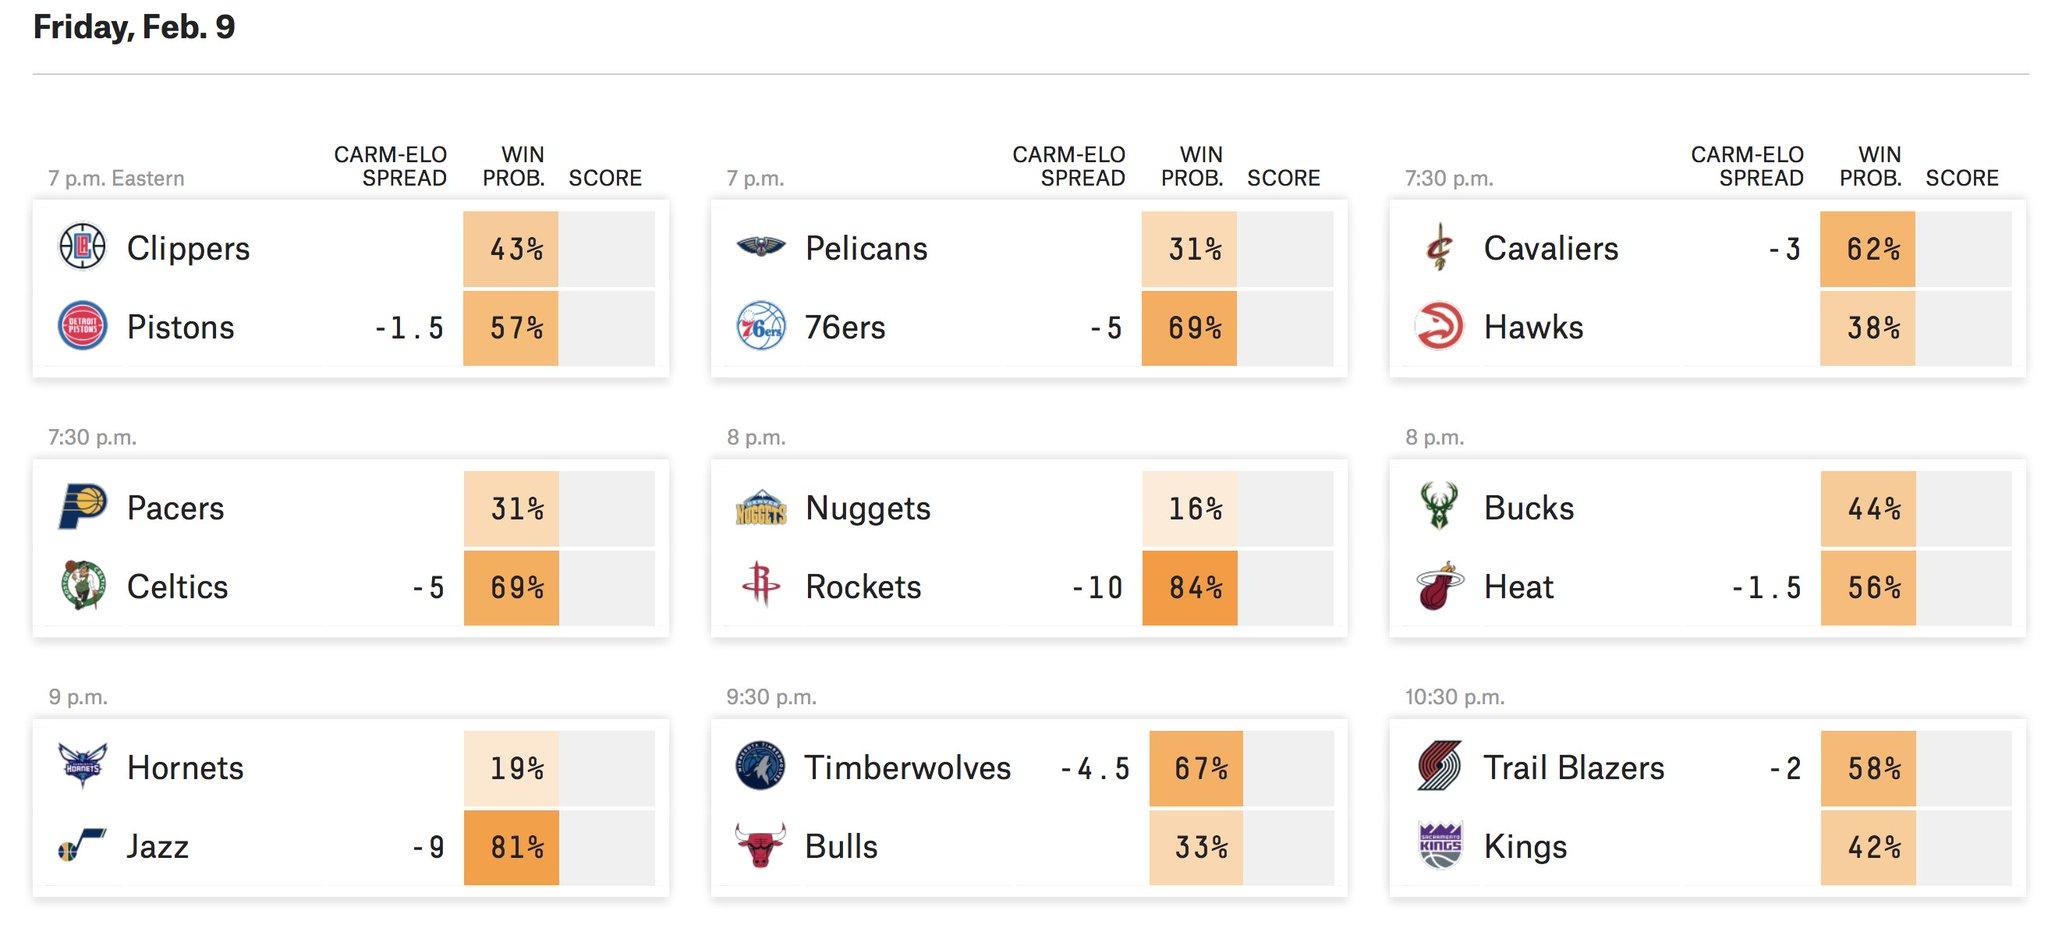 NBA games tonight: https://t.co/hmiYv8MByb https://t.co/4zBcziUgG0